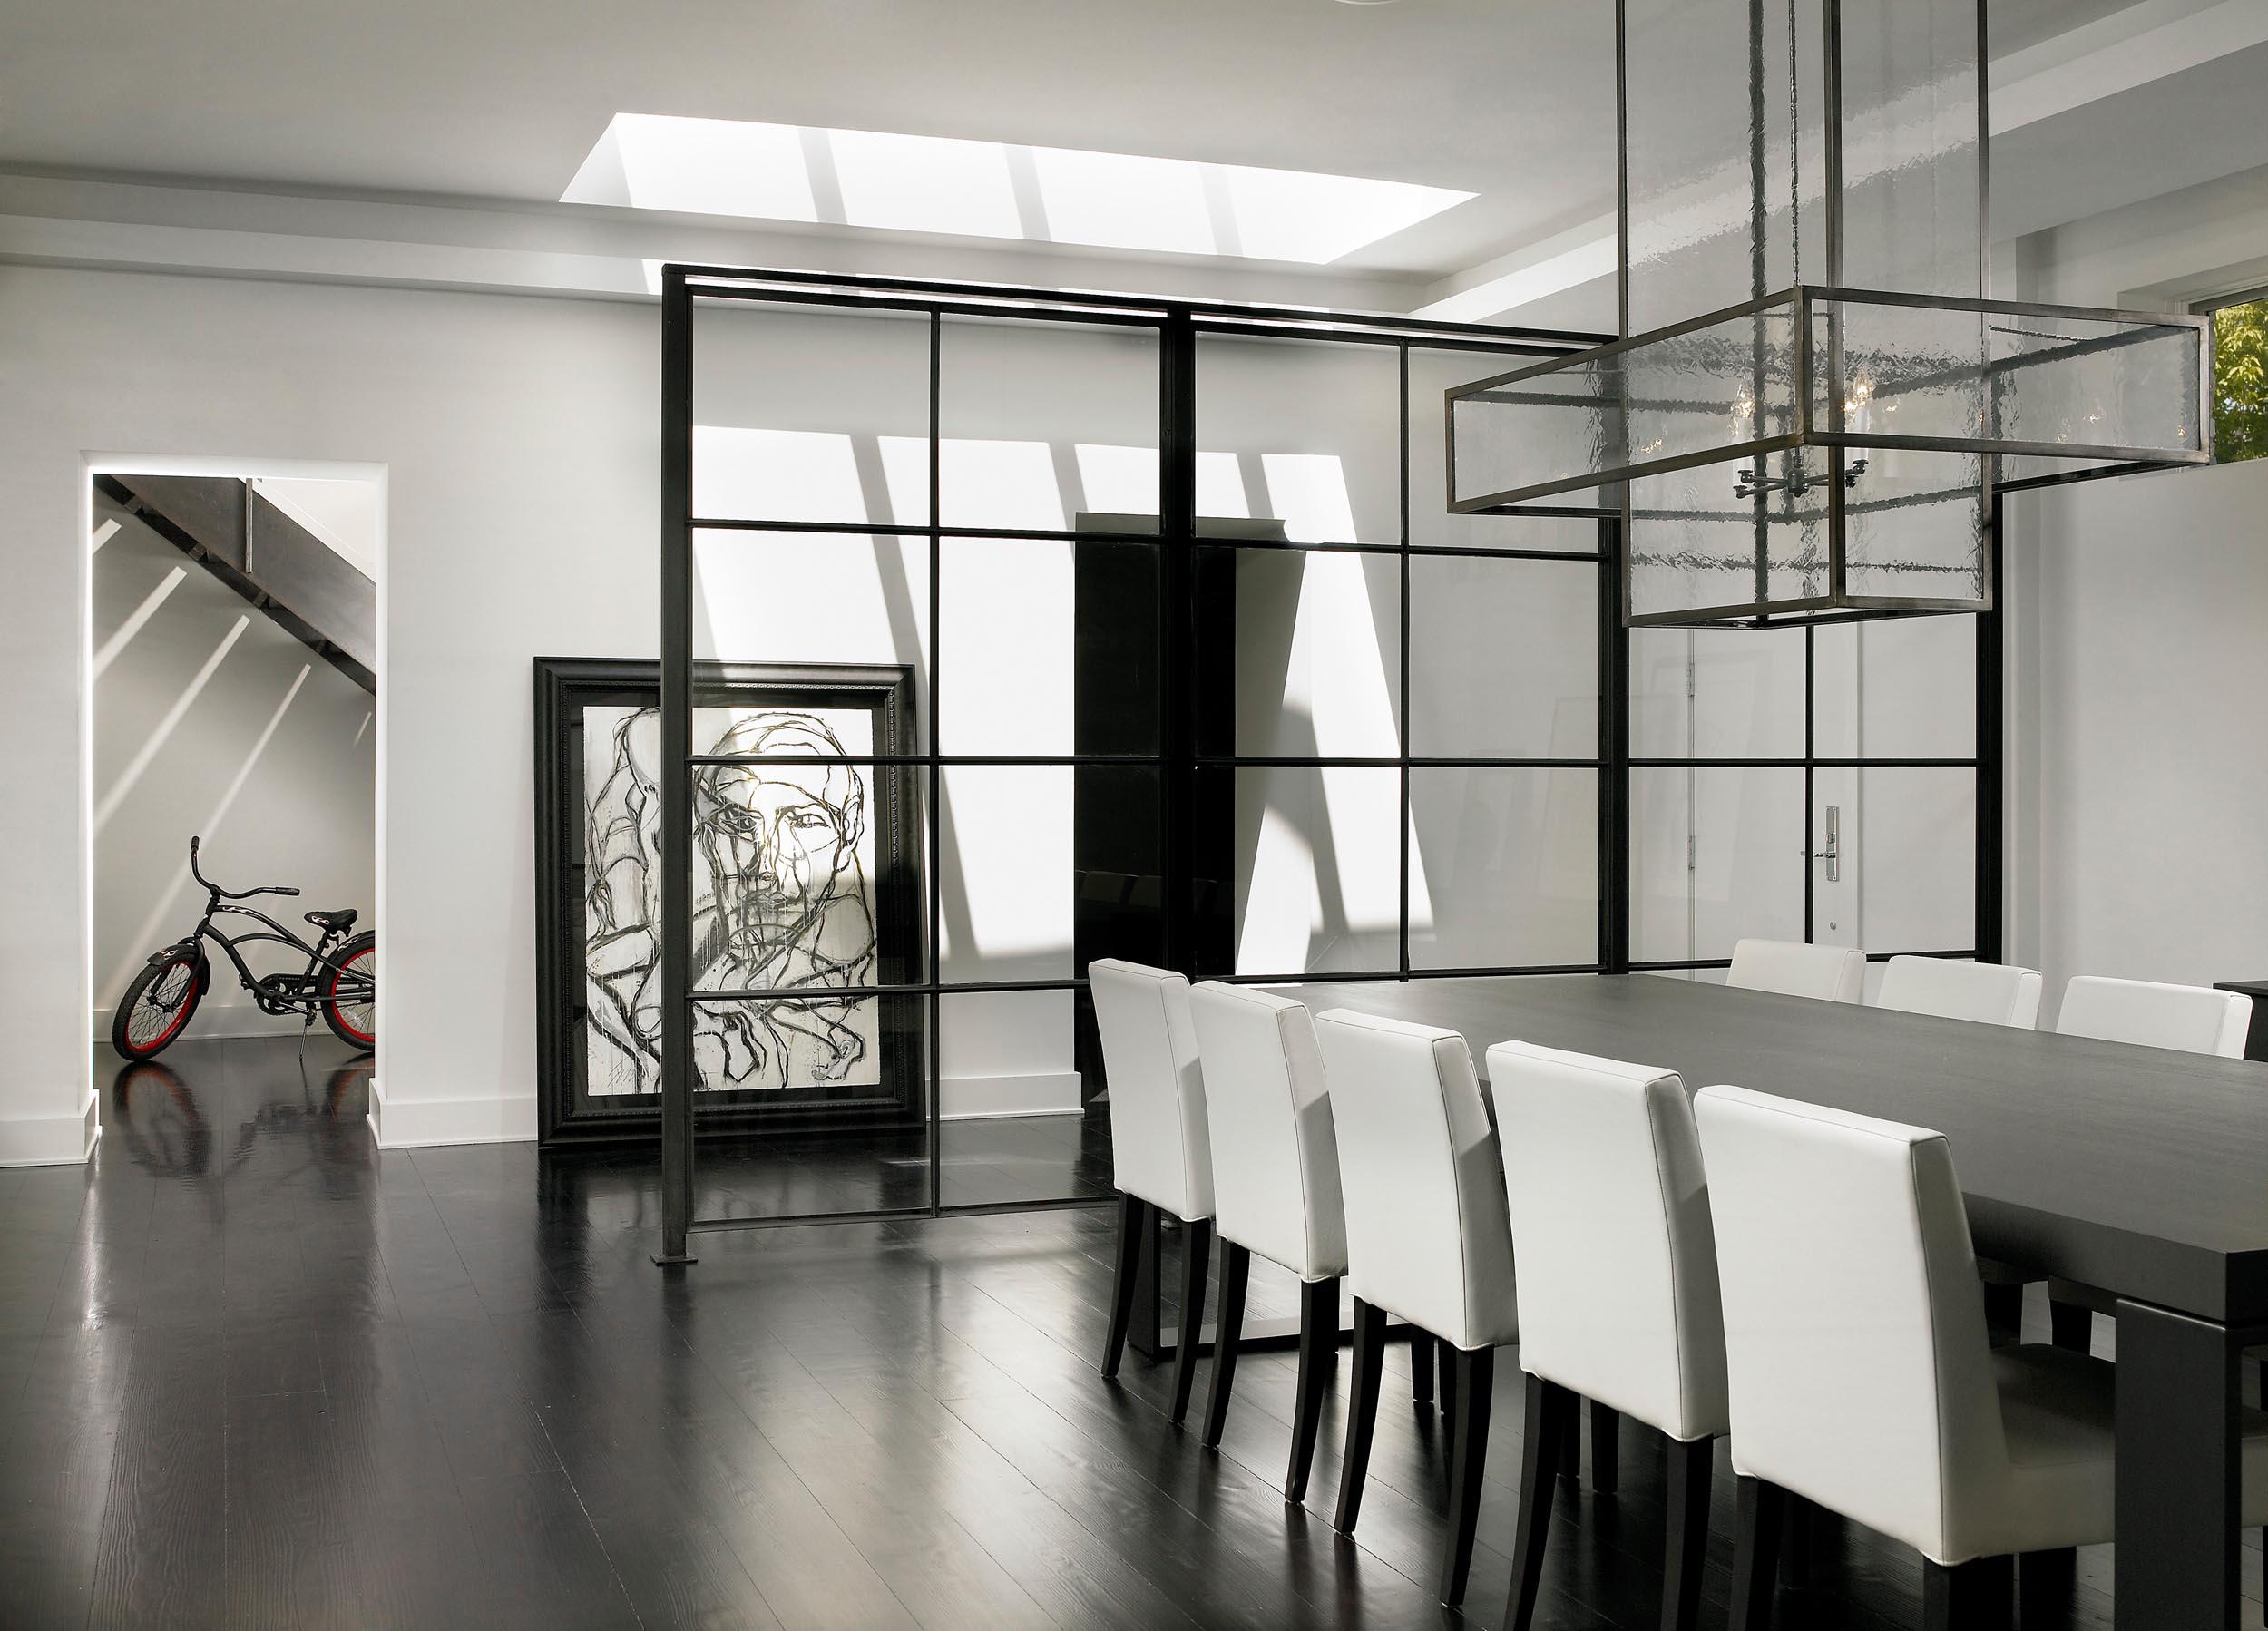 Leo_Designs_Chicago_interior_design_contemporary_inspired_nail_factory_conversion7.jpg